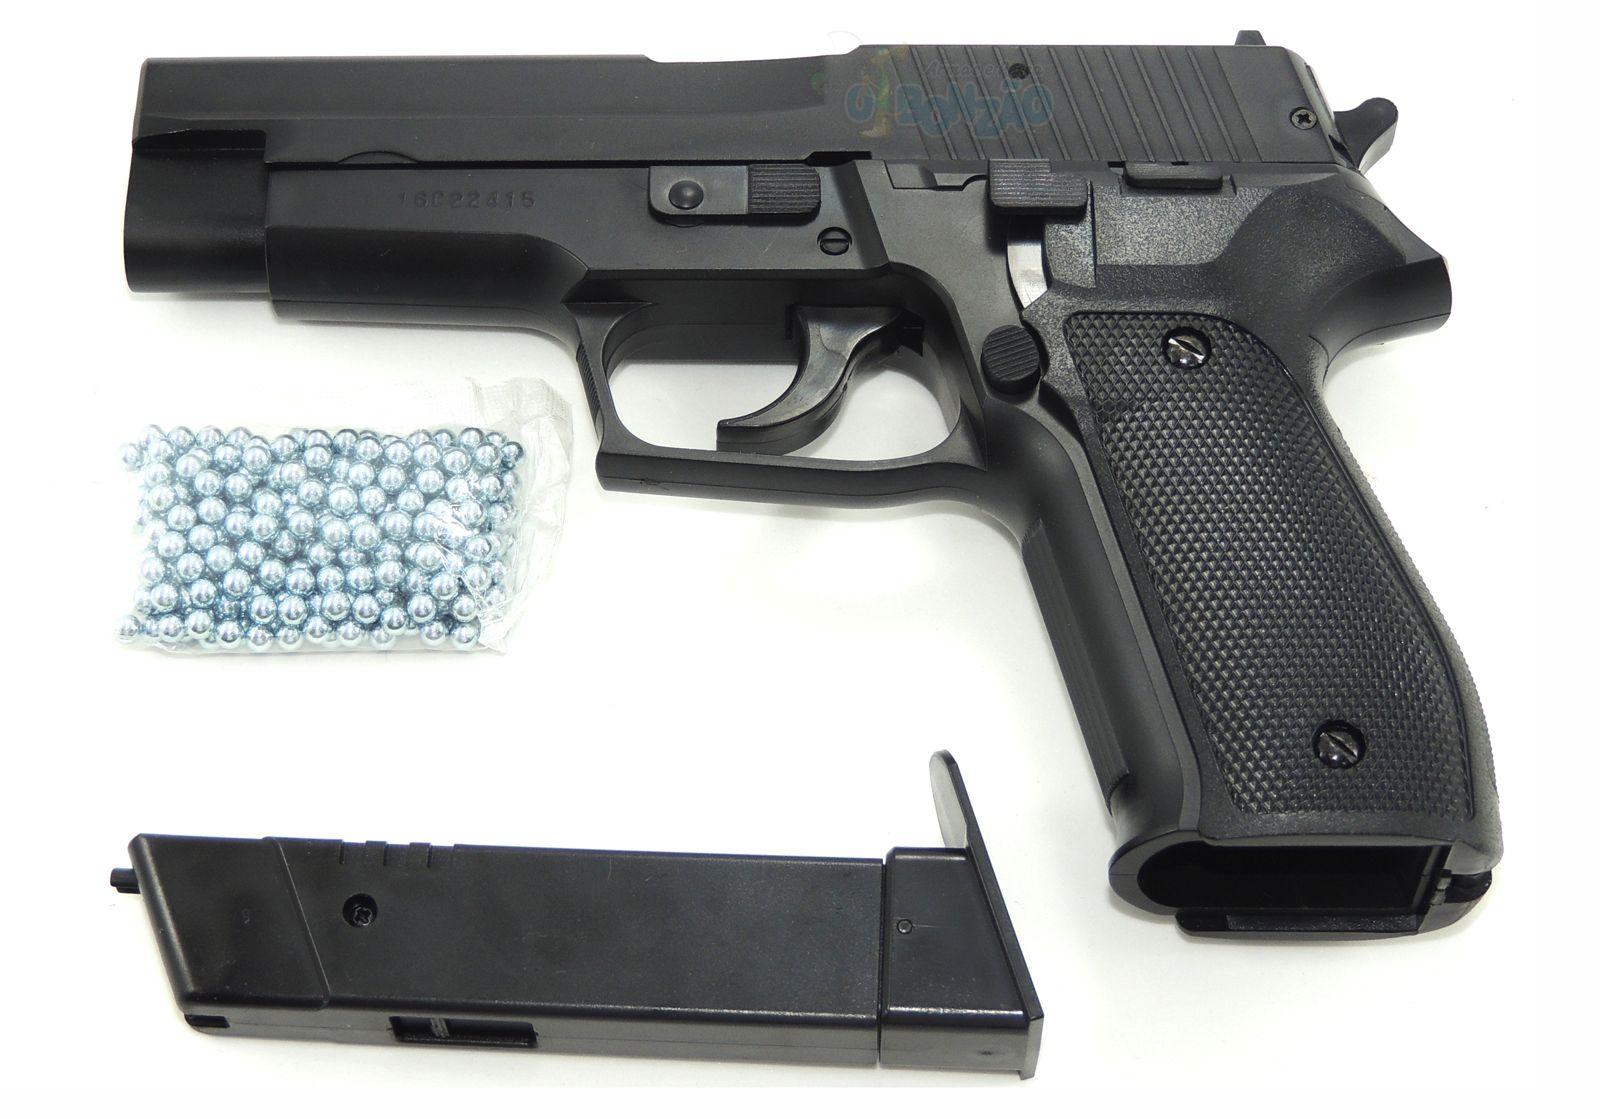 Pistola de Pressão P226 KWC Spring Slide Metal 4.5mmm